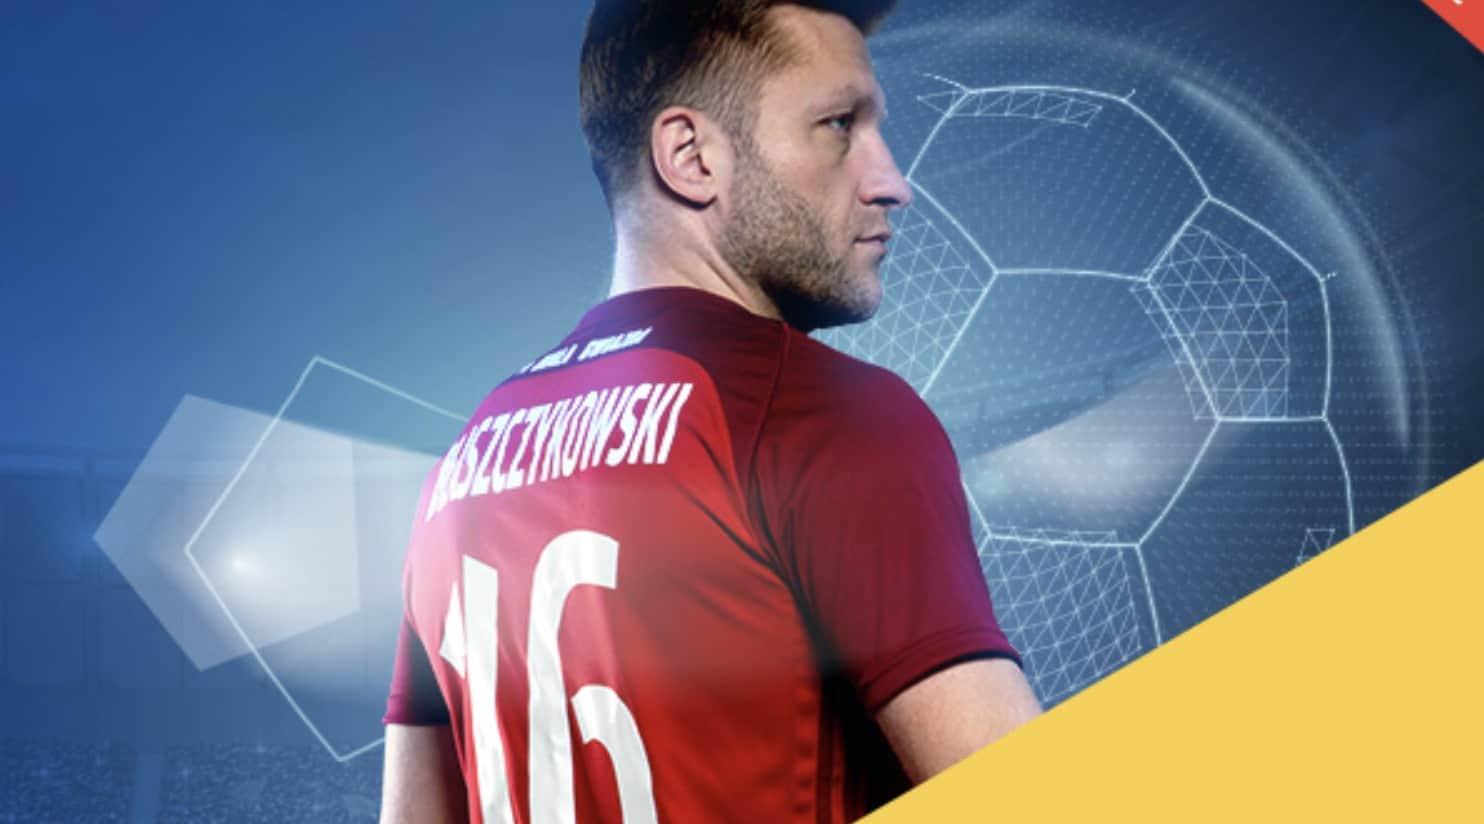 LV BET konkurs na Ekstraklasę. Do wygrania nawet 10.000 PLN!